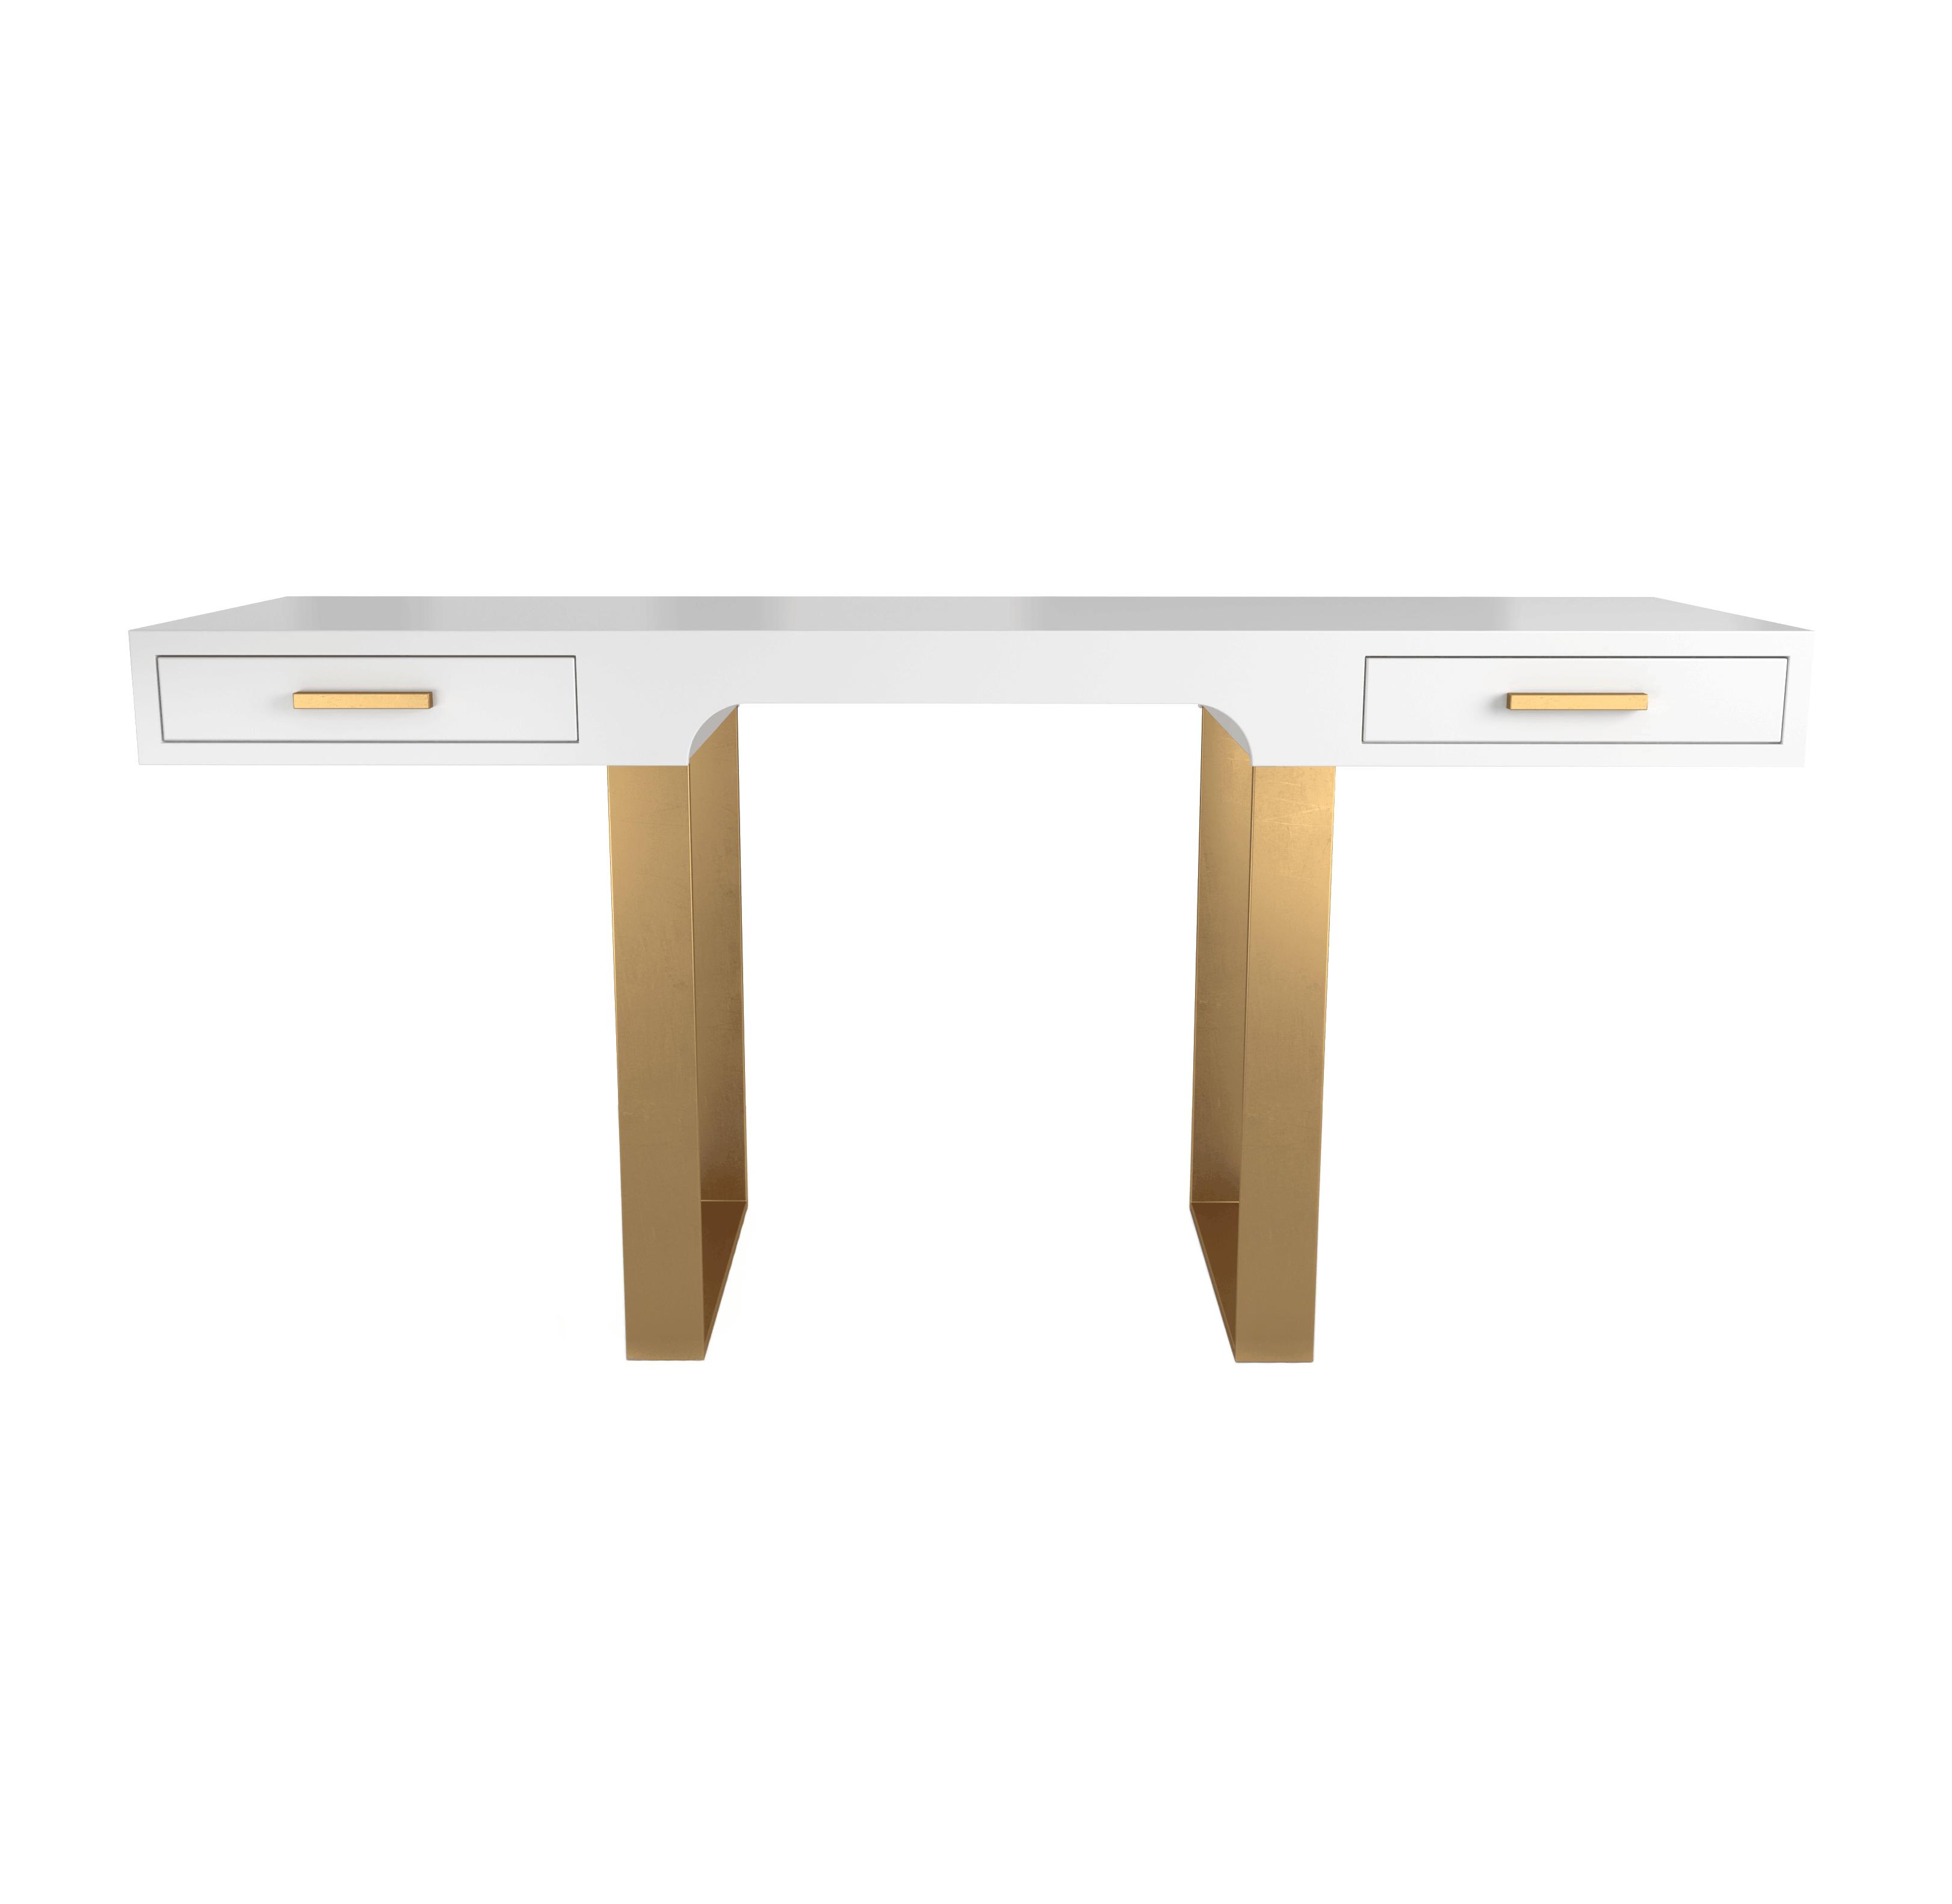 Письменный стол P012 Any-Home - P012 | AnyHome.ru